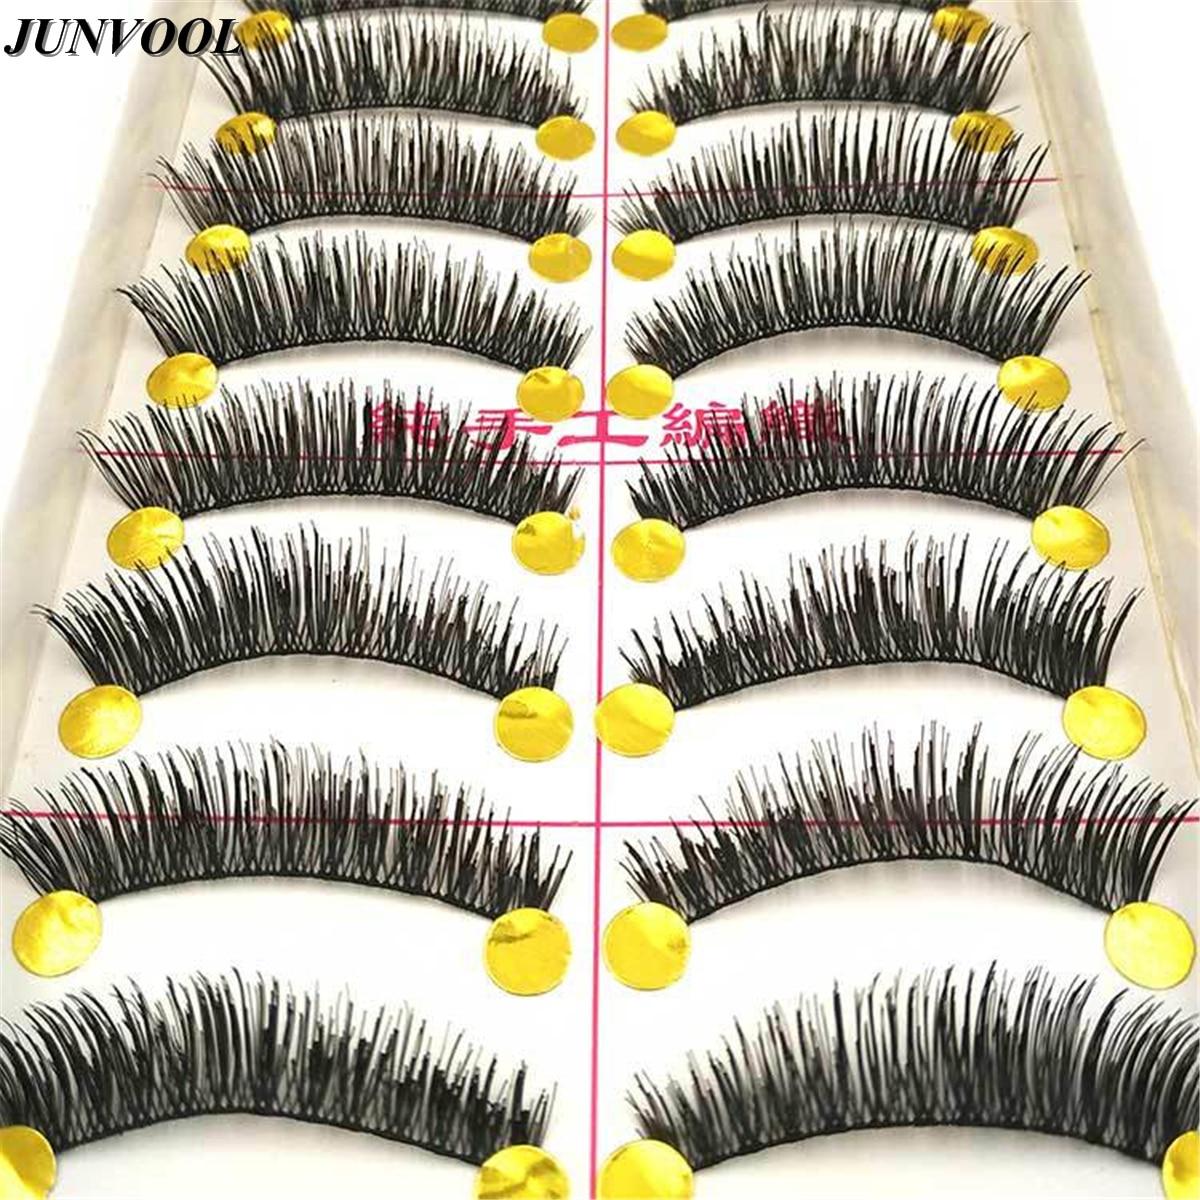 In Design; 10pairs Professional New Black Natural Long Thick Cross Makeup Beauty False Eyelashes Fake Eye Lashes Extension Tools Novel